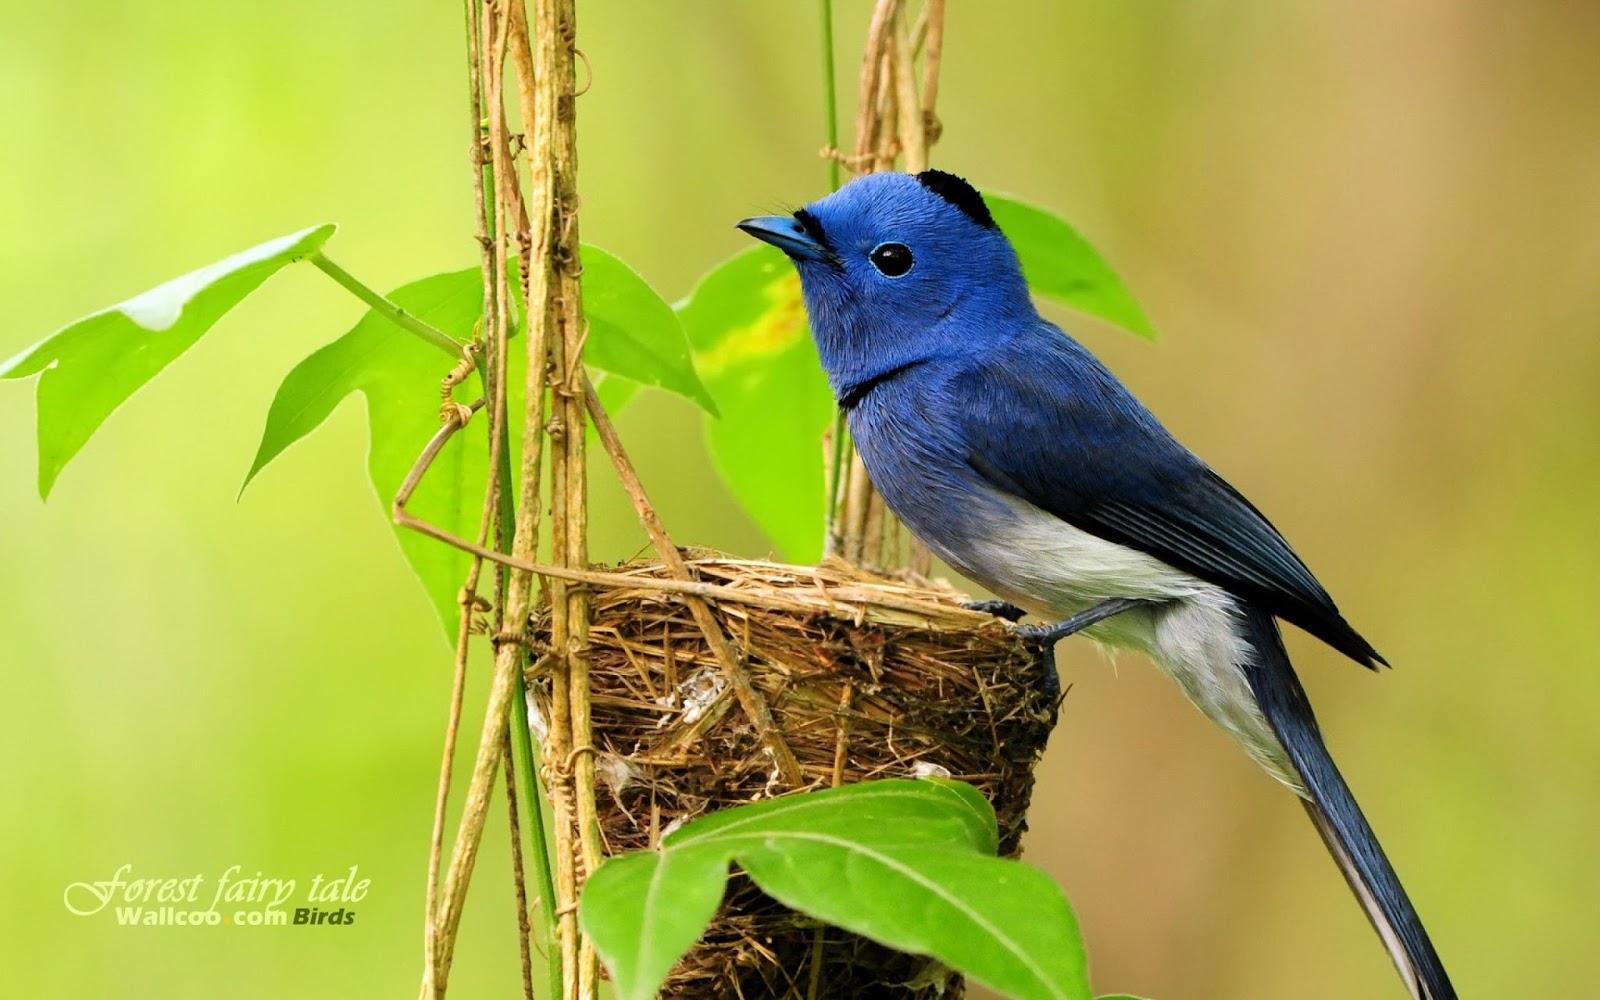 blue birds photos blue birds photos blue birds images blue 1600x1000